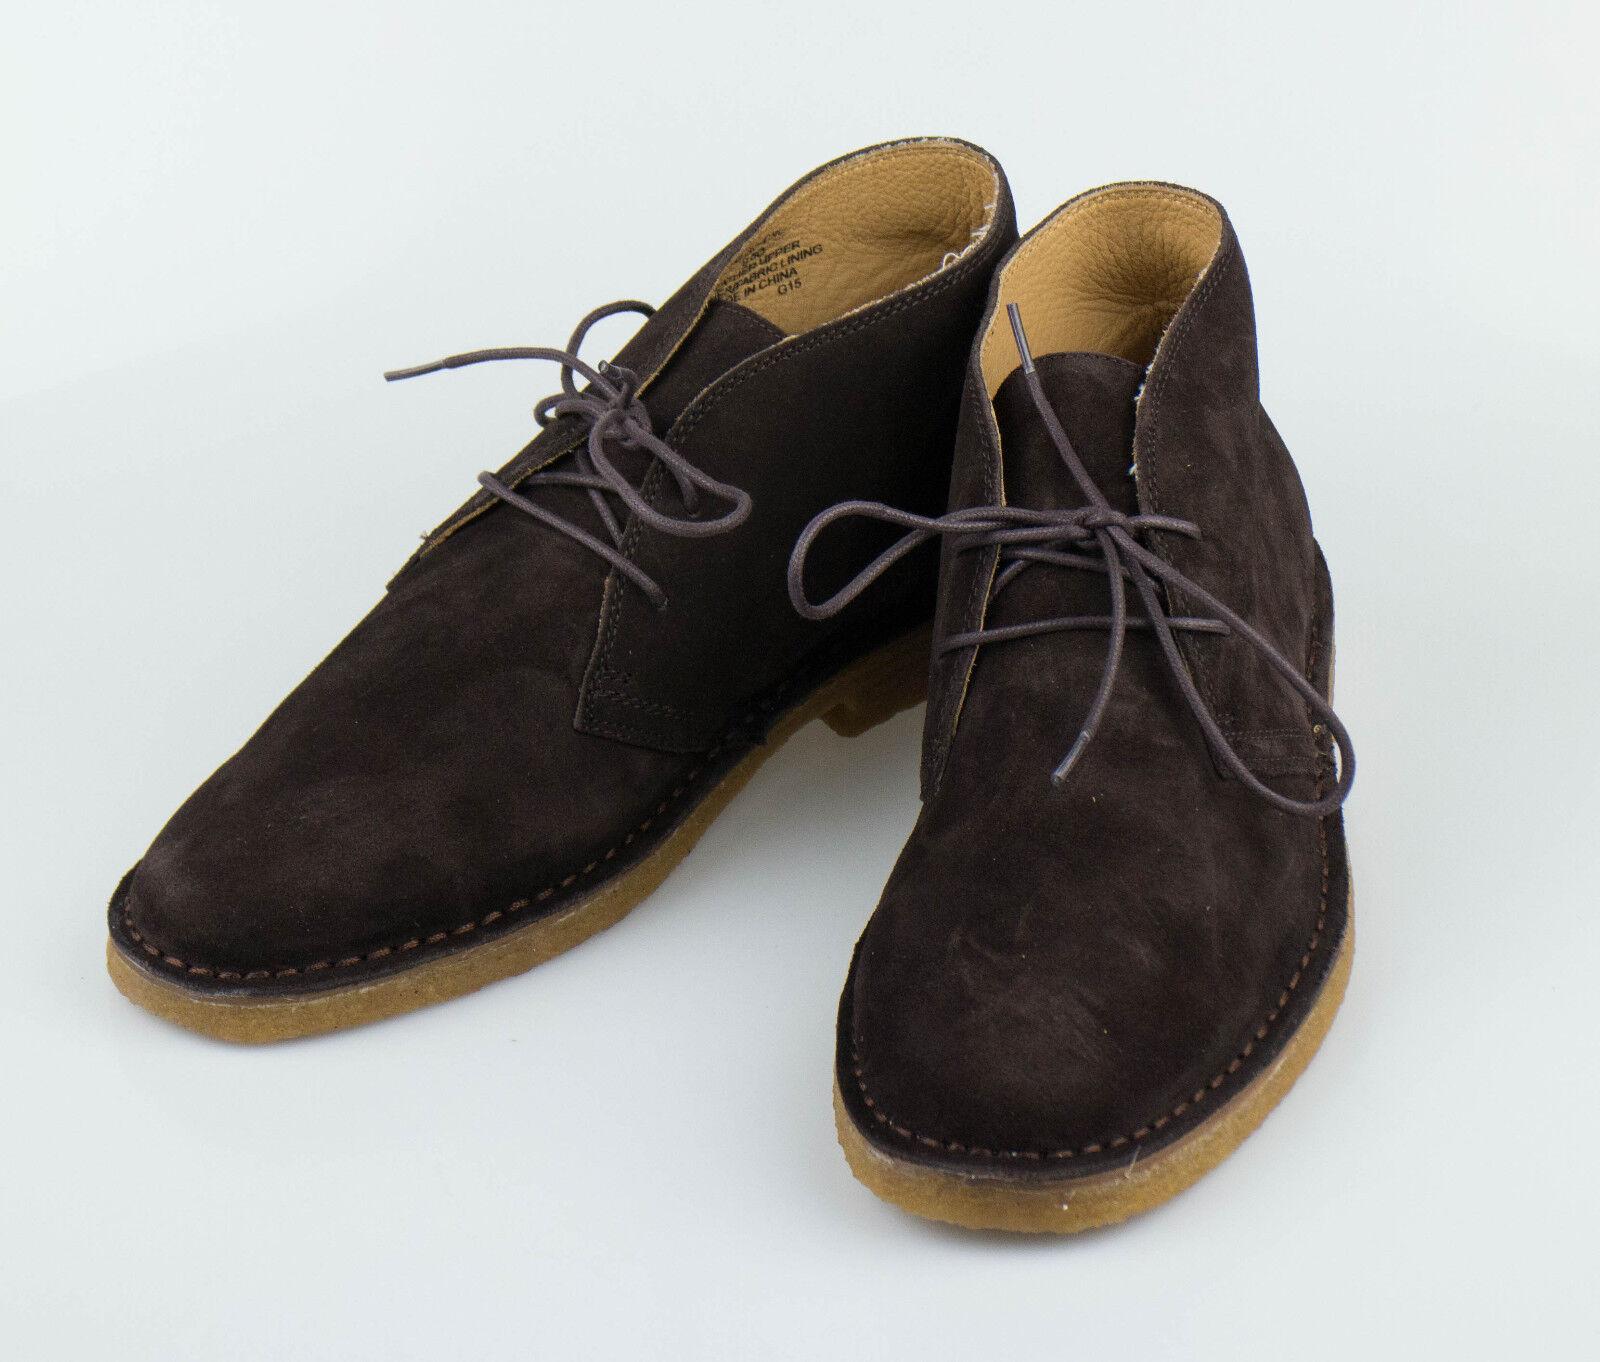 NIB. POLO RALPH LAUREN King Bistre Brown Suede Suede Suede Desert Stivali Shoes 9.5 D  395 5f906b